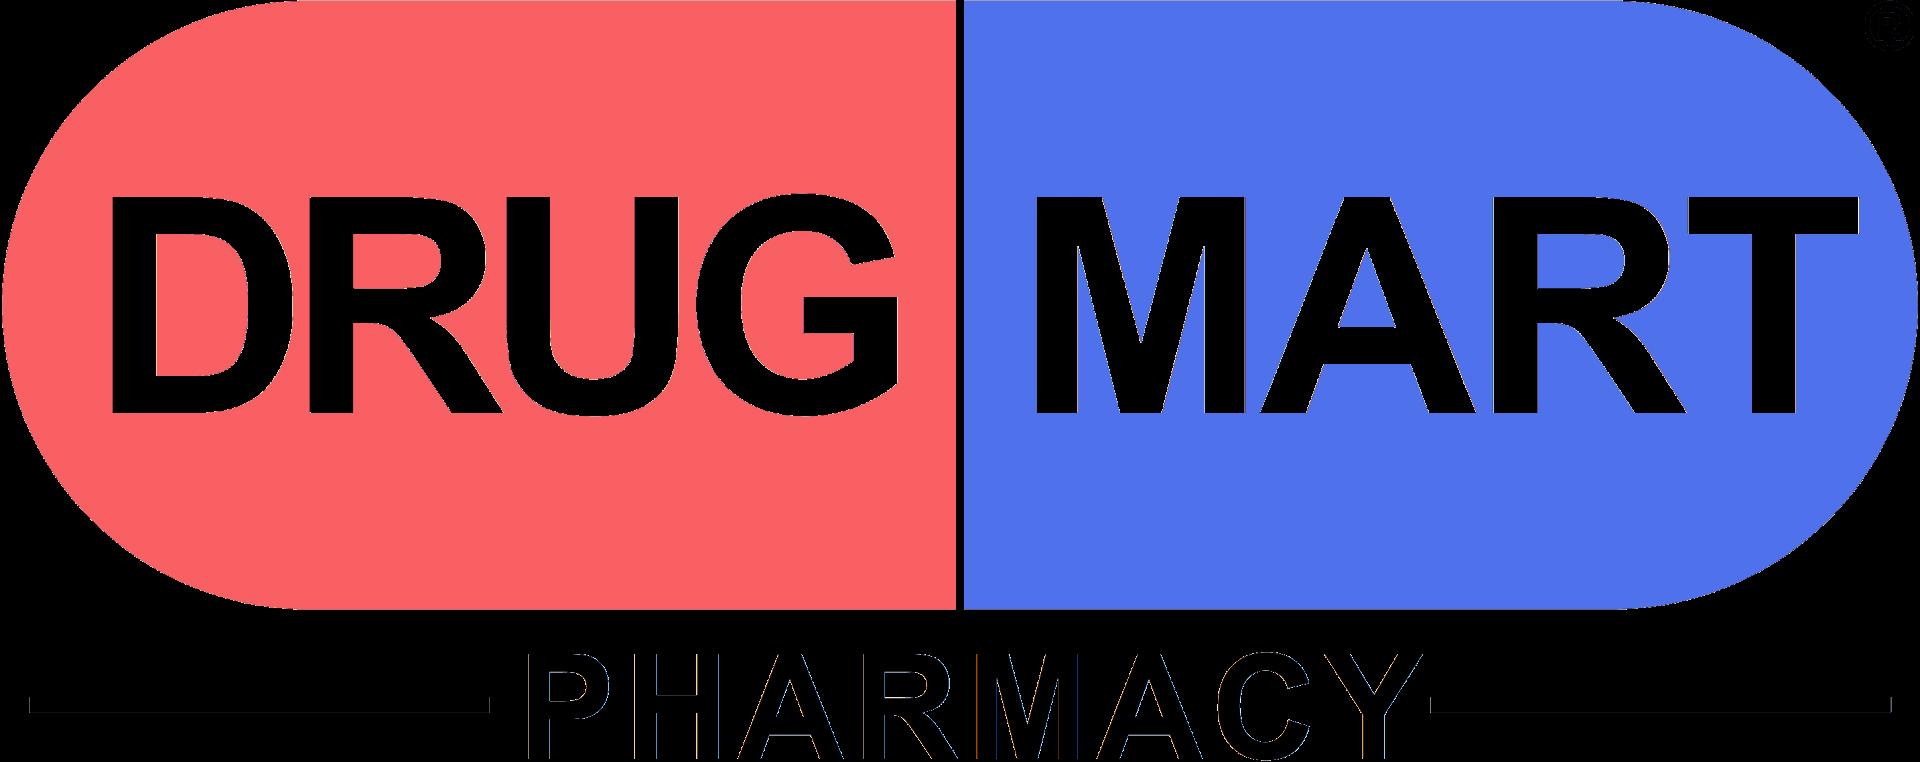 Logo de Drug Mart